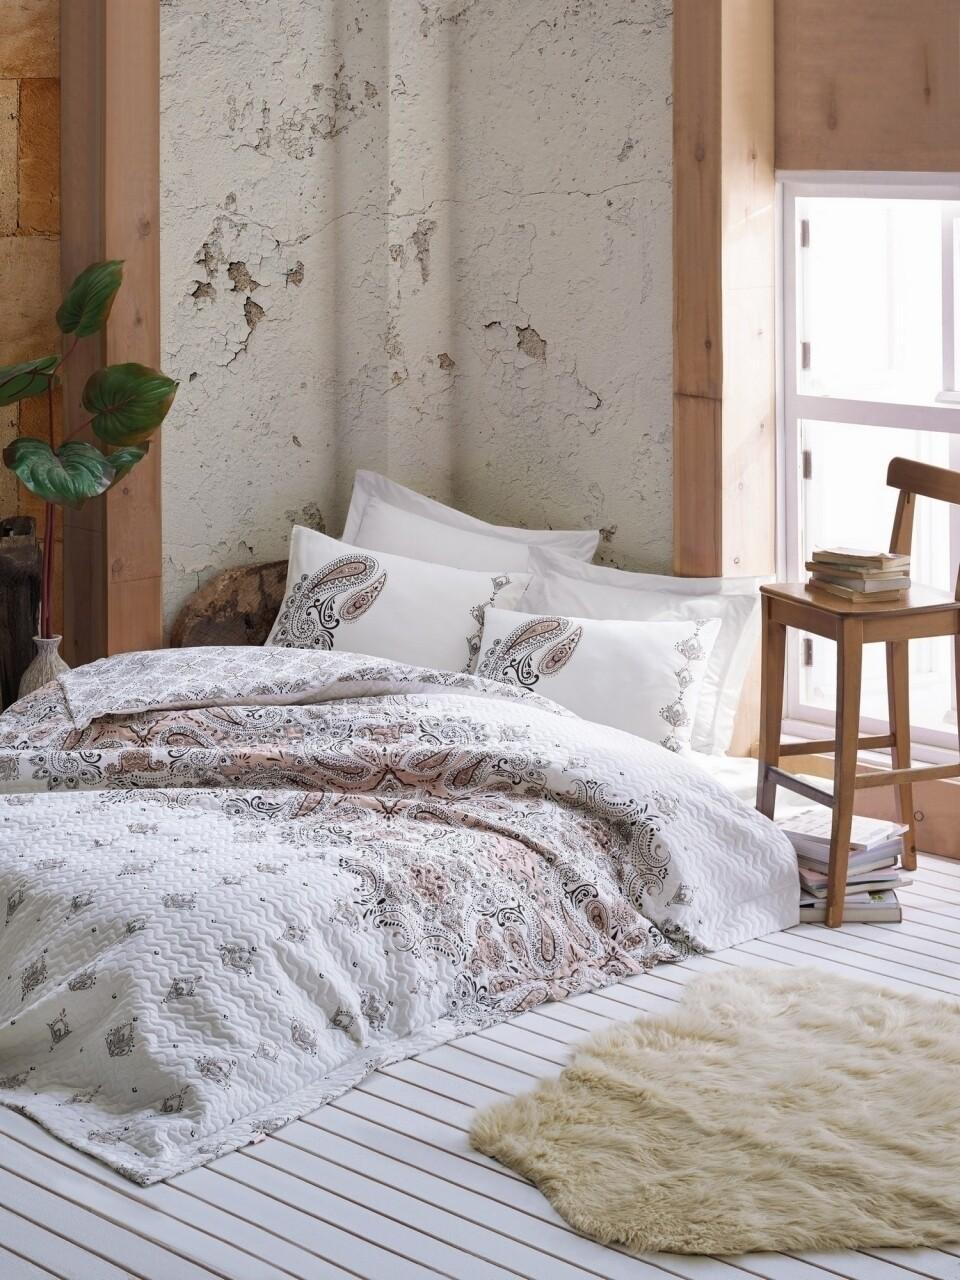 Lenjerie de pat matlasata pentru 2 persoane, 4 piese, 100% bumbac ranforce, Cotton Box, Harley